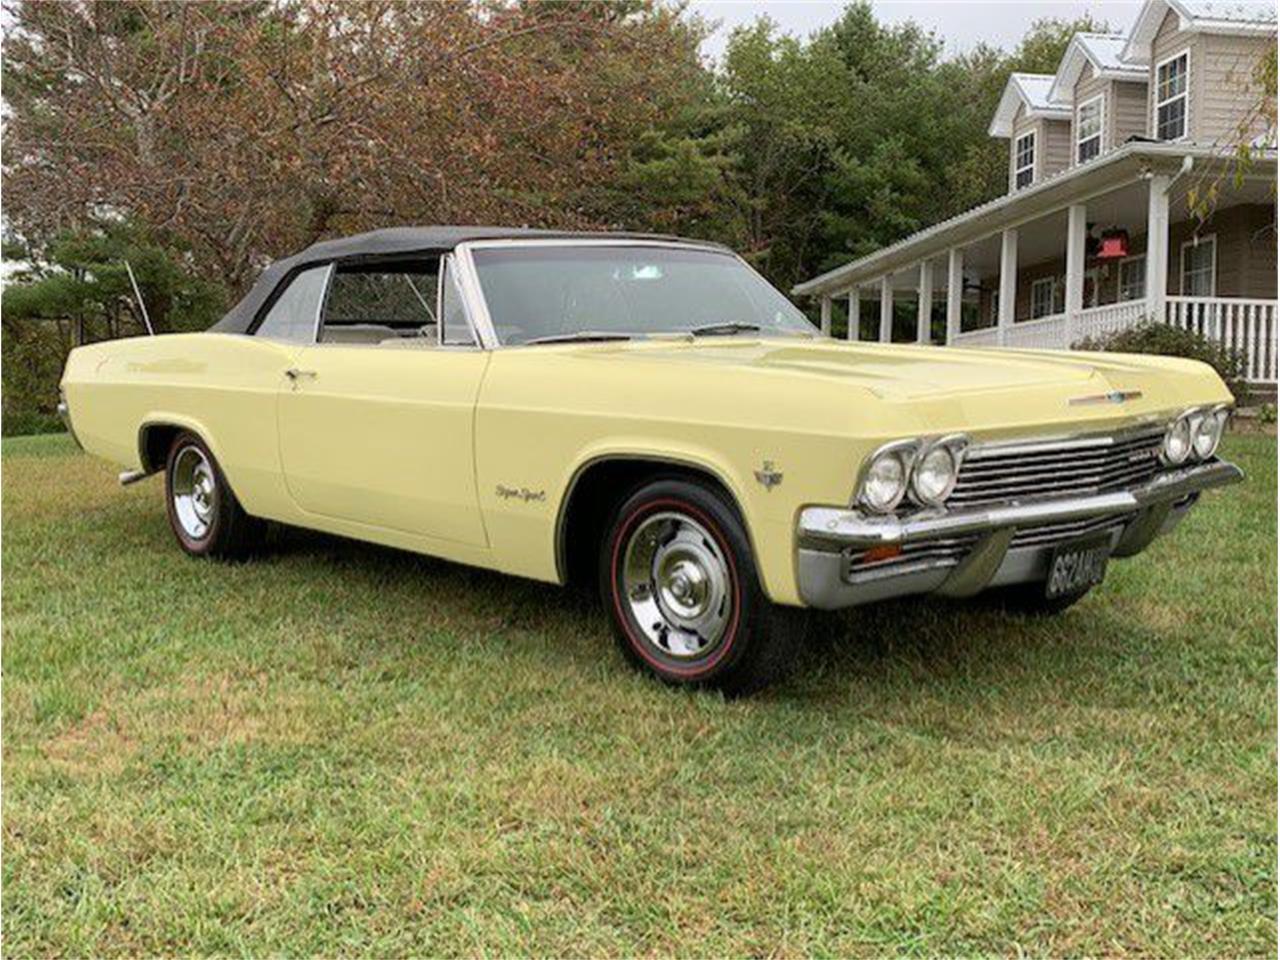 1965 Chevrolet Impala (CC-1374613) for sale in West Pittston, Pennsylvania